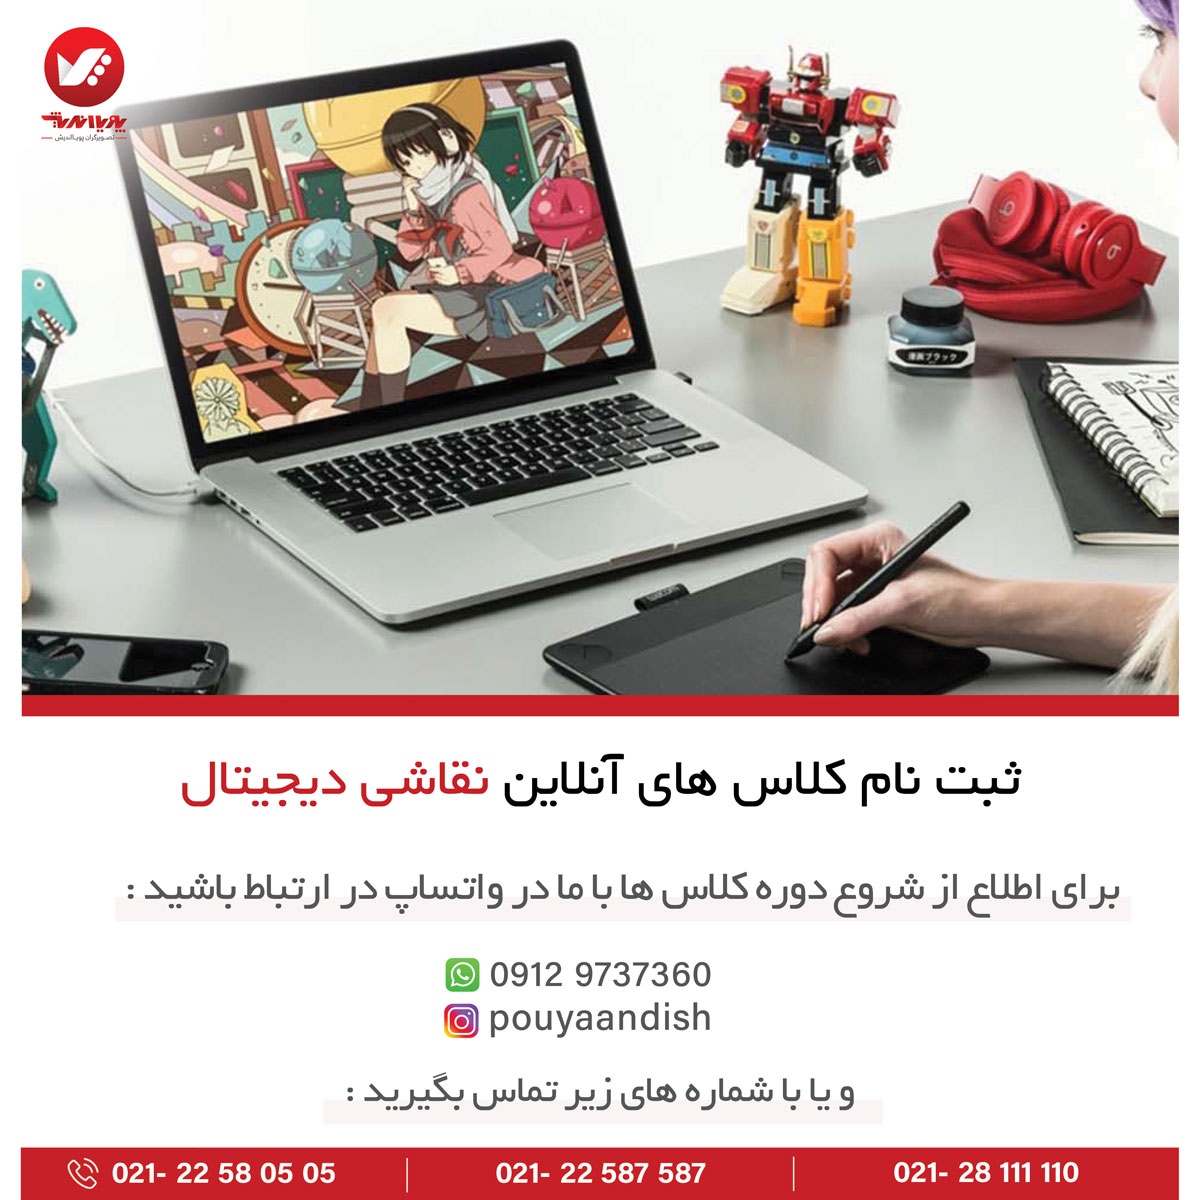 digital sabtenam painting - آموزش آنلاین نقاشی دیجیتال | آموزش مجازی دیجیتال پینتیگ